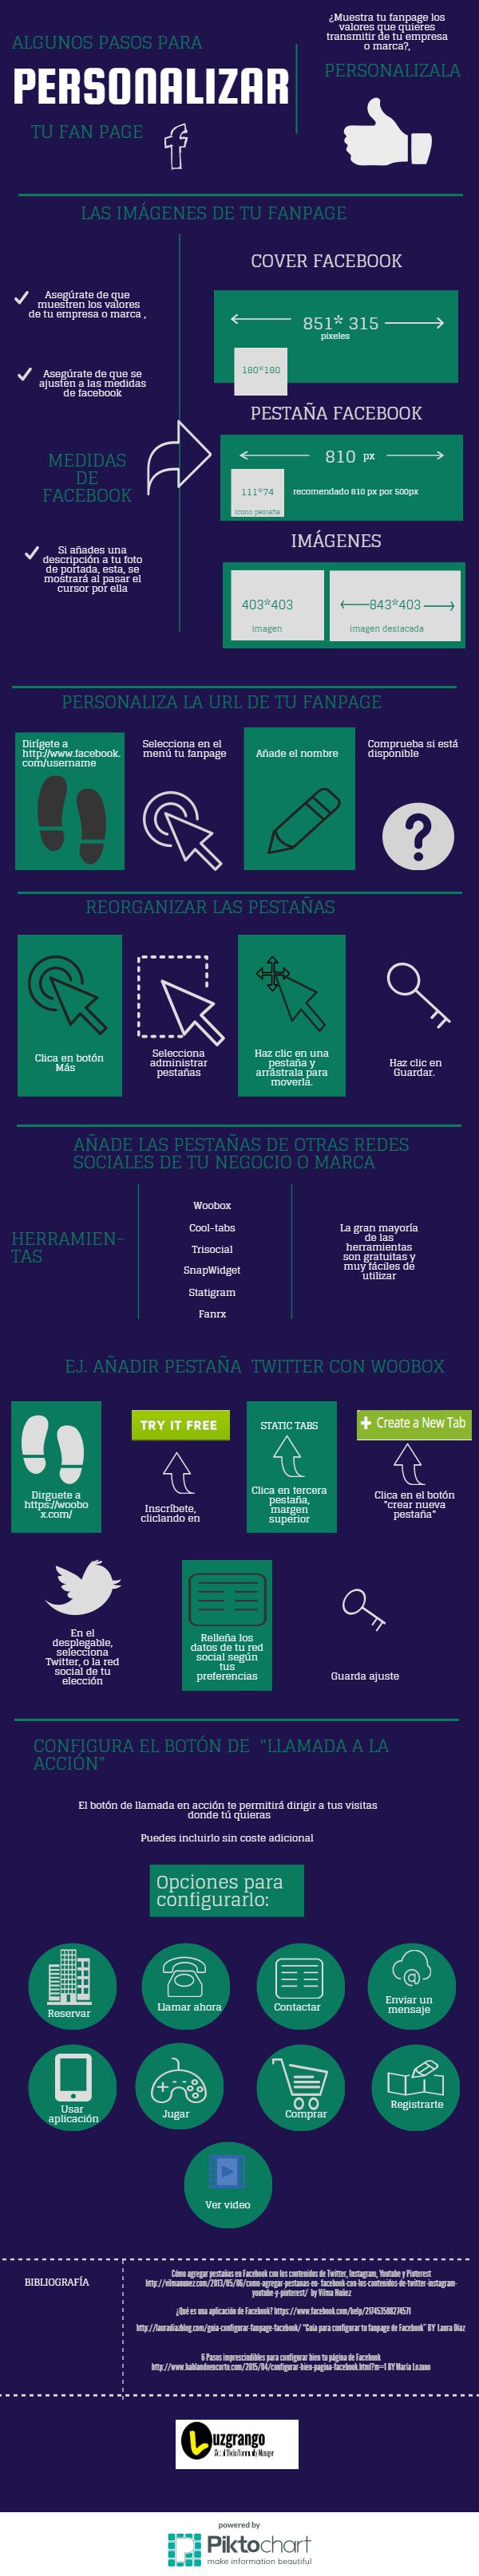 Cómo personalizar tu fan page de Facebook #infografia #infographic #socialmedia  Want more business from social media? zackswimsmm.tk